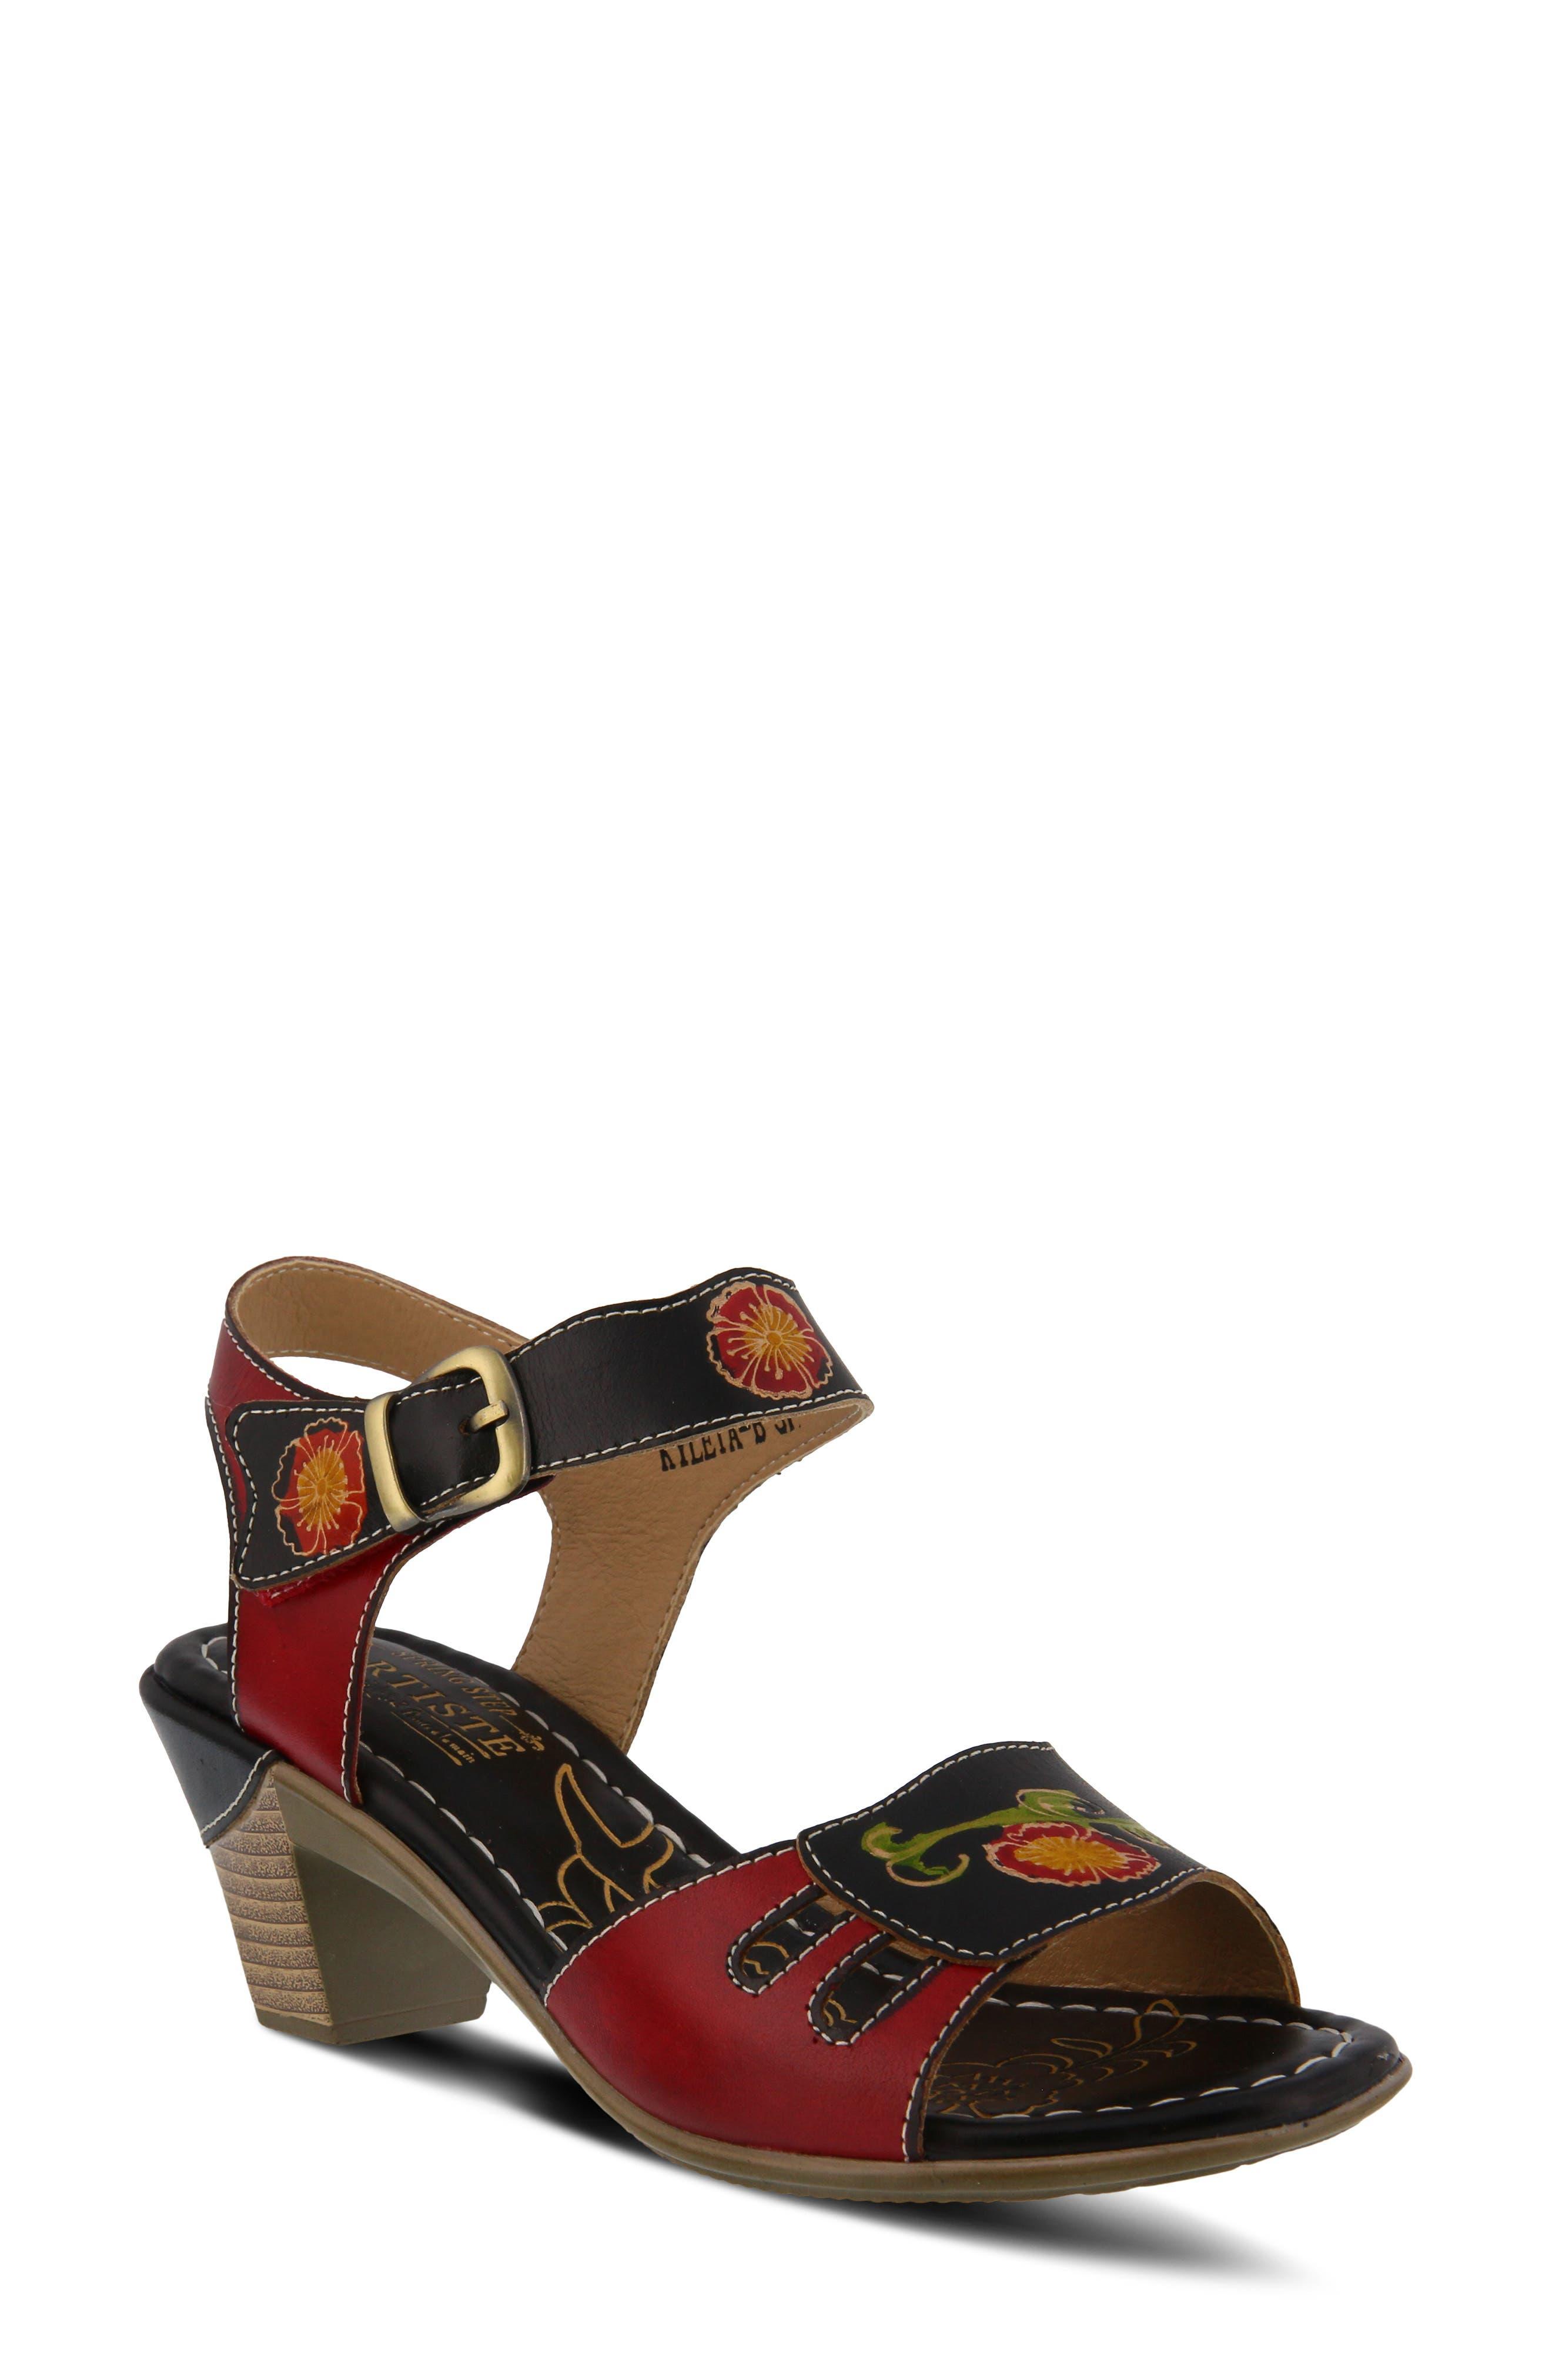 e97122ab6f68 L artiste Ankle Strap Sandals for Women